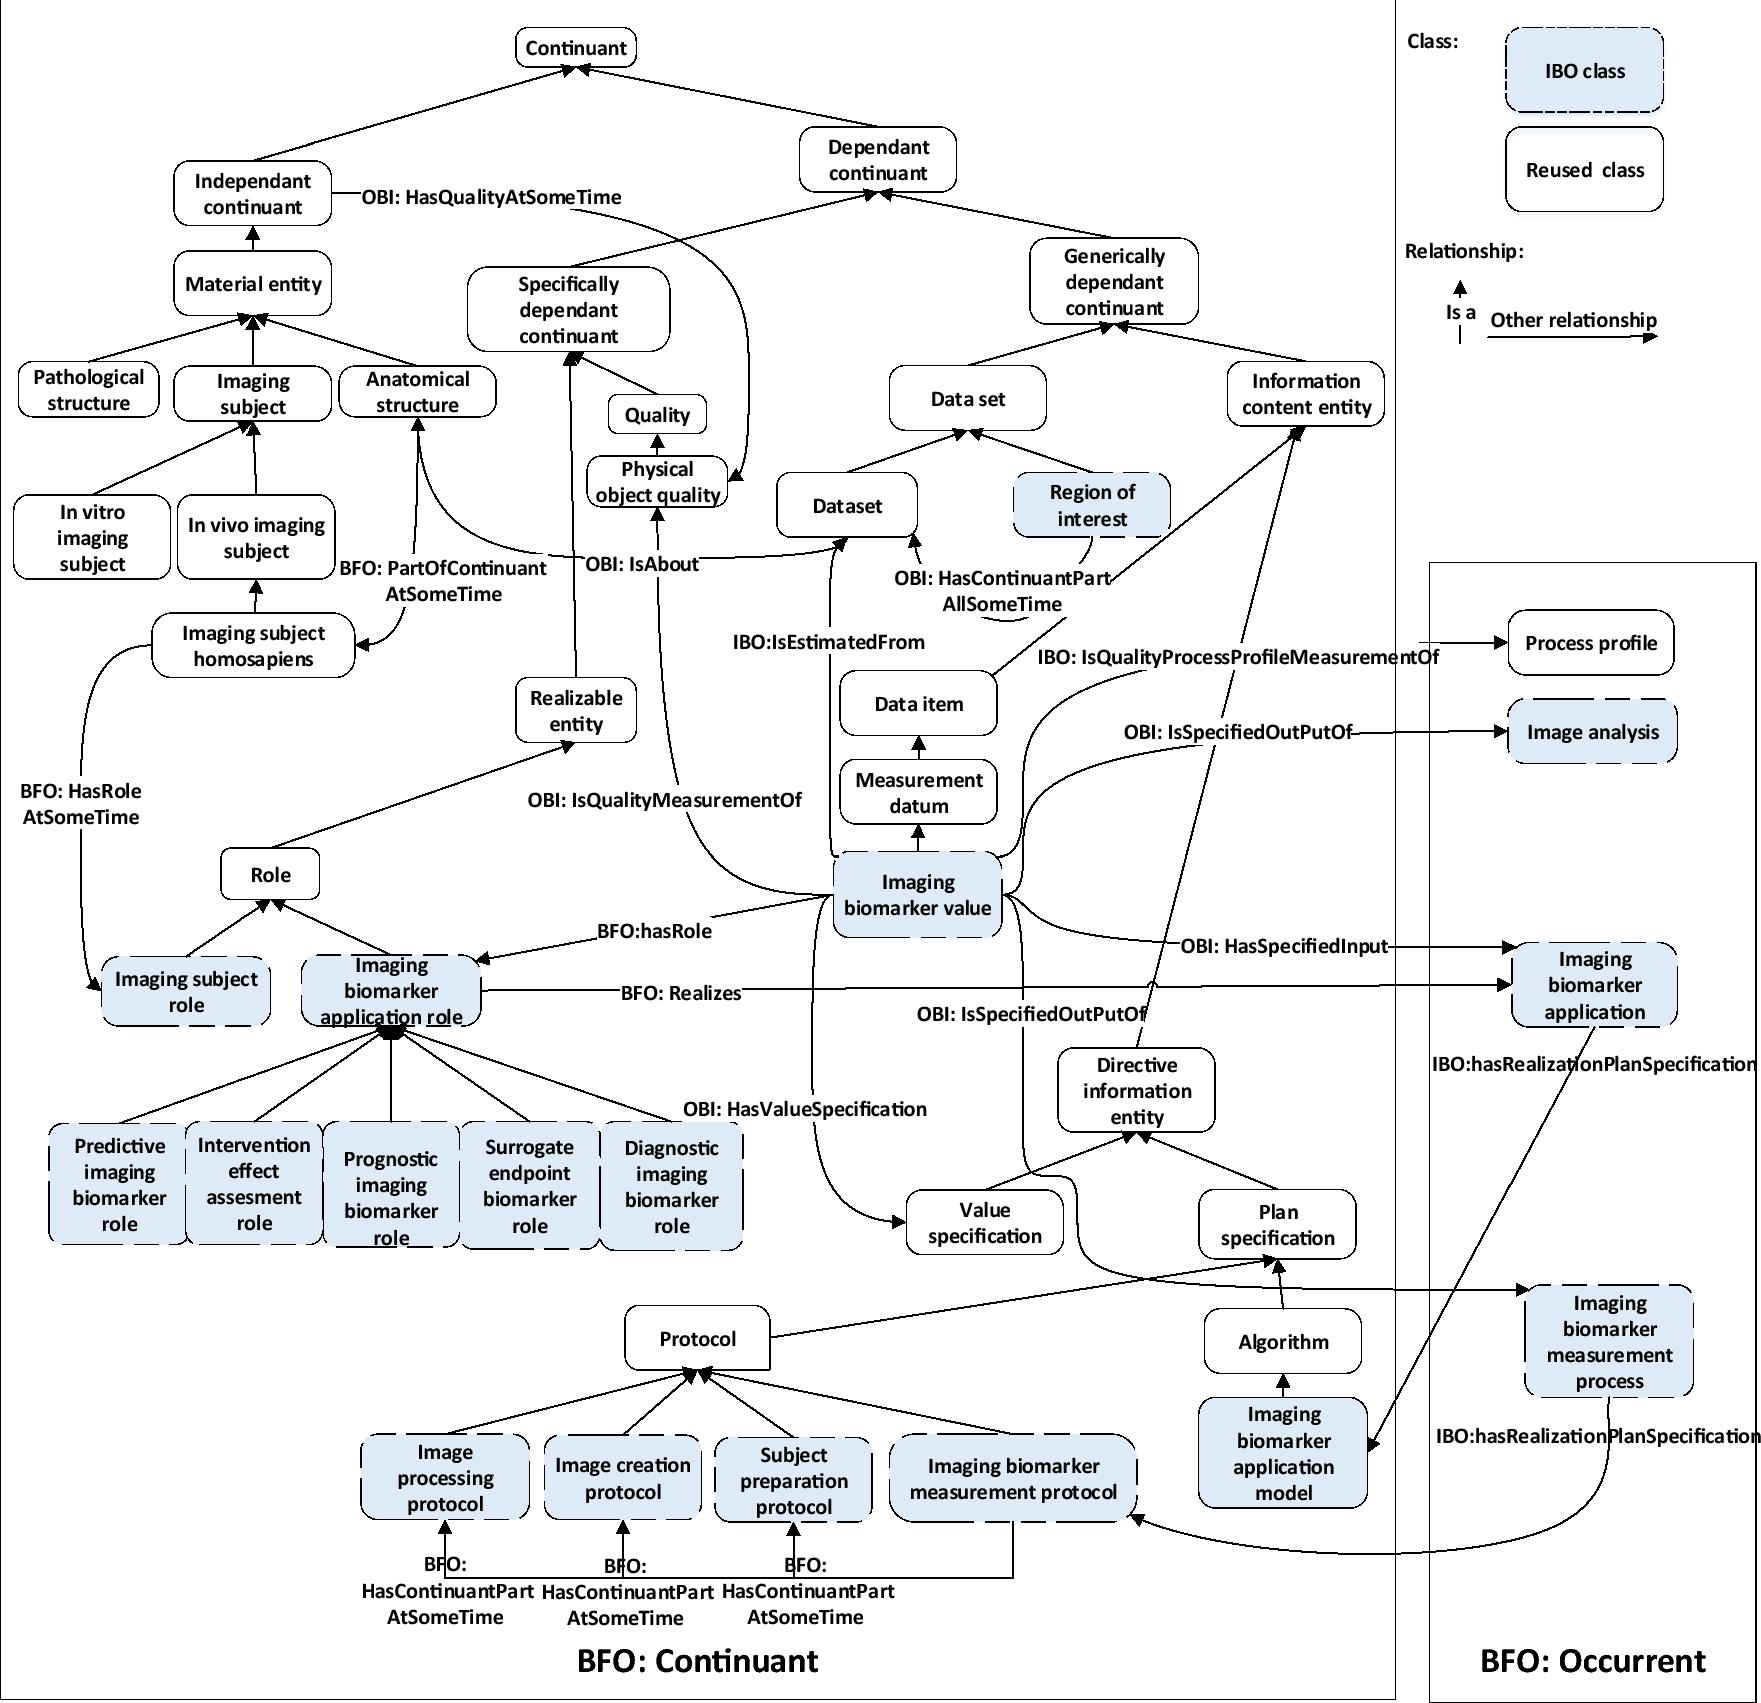 Imaging Biomarker Ontology (IBO): A Biomedical Ontology to